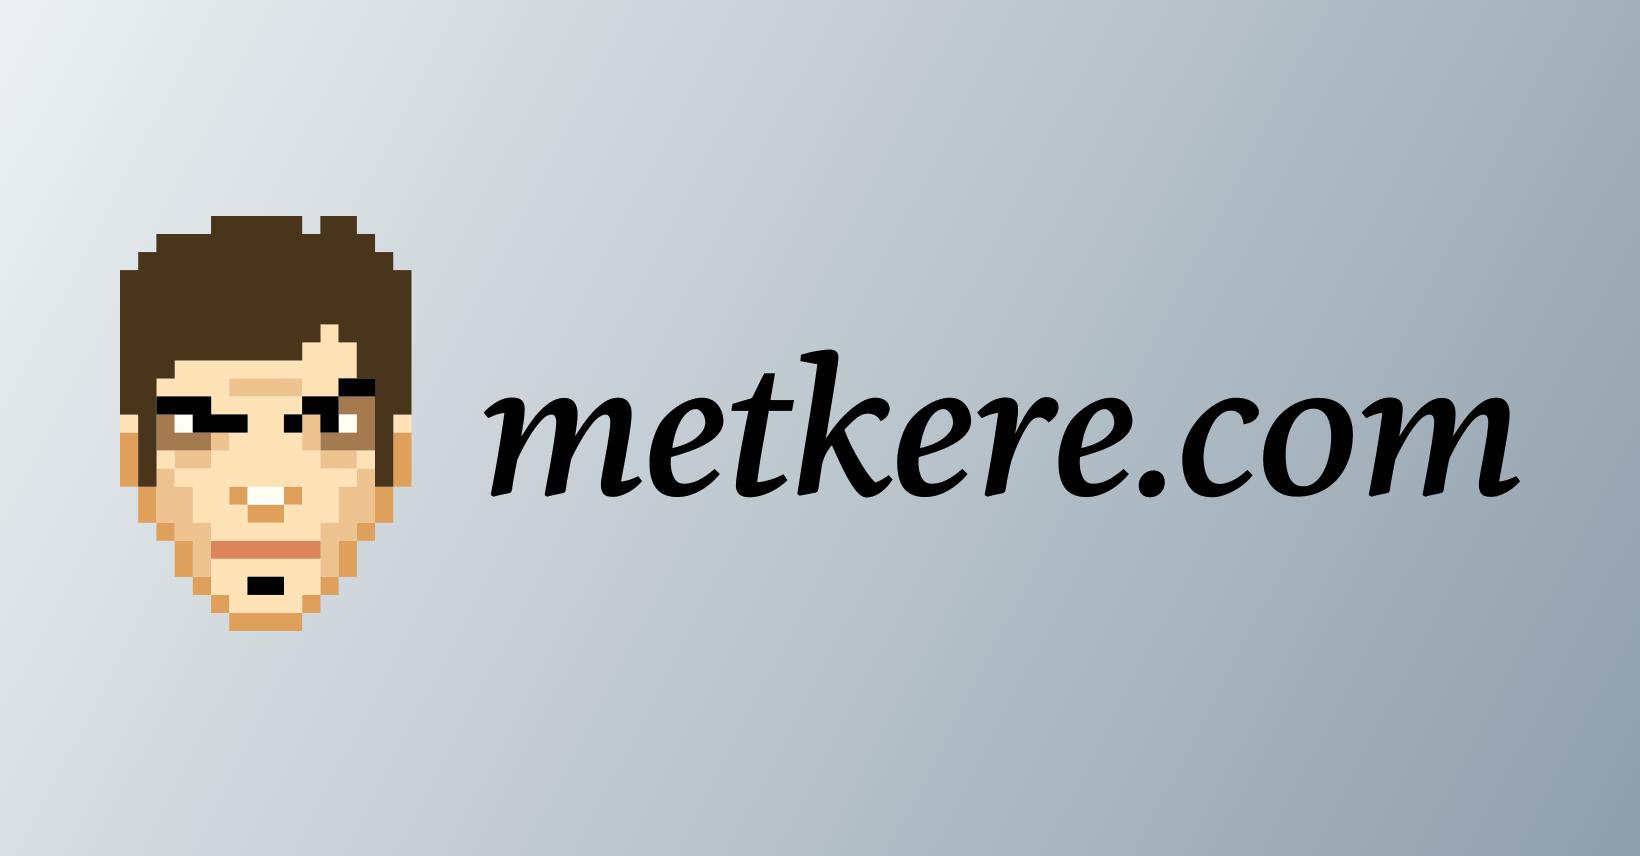 Metkere.com